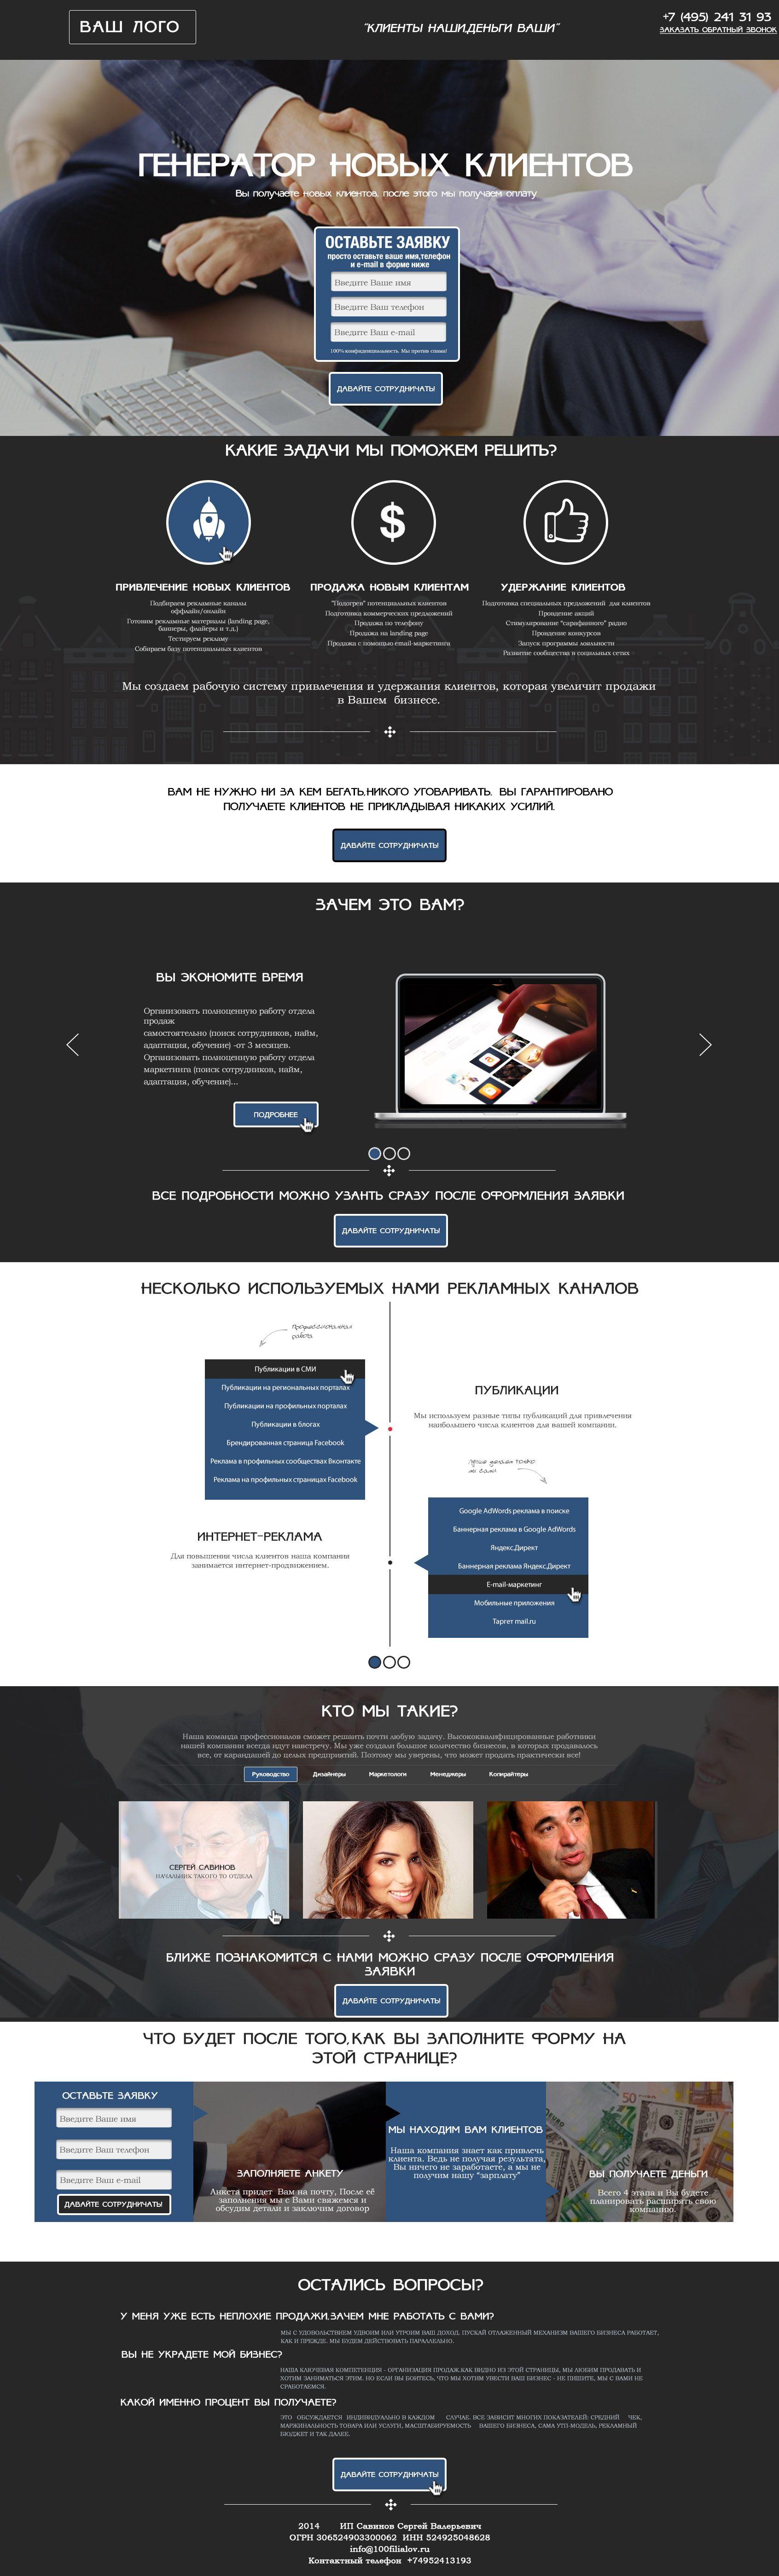 Landing page услуги для бизнеса - дизайнер PelmeshkOsS